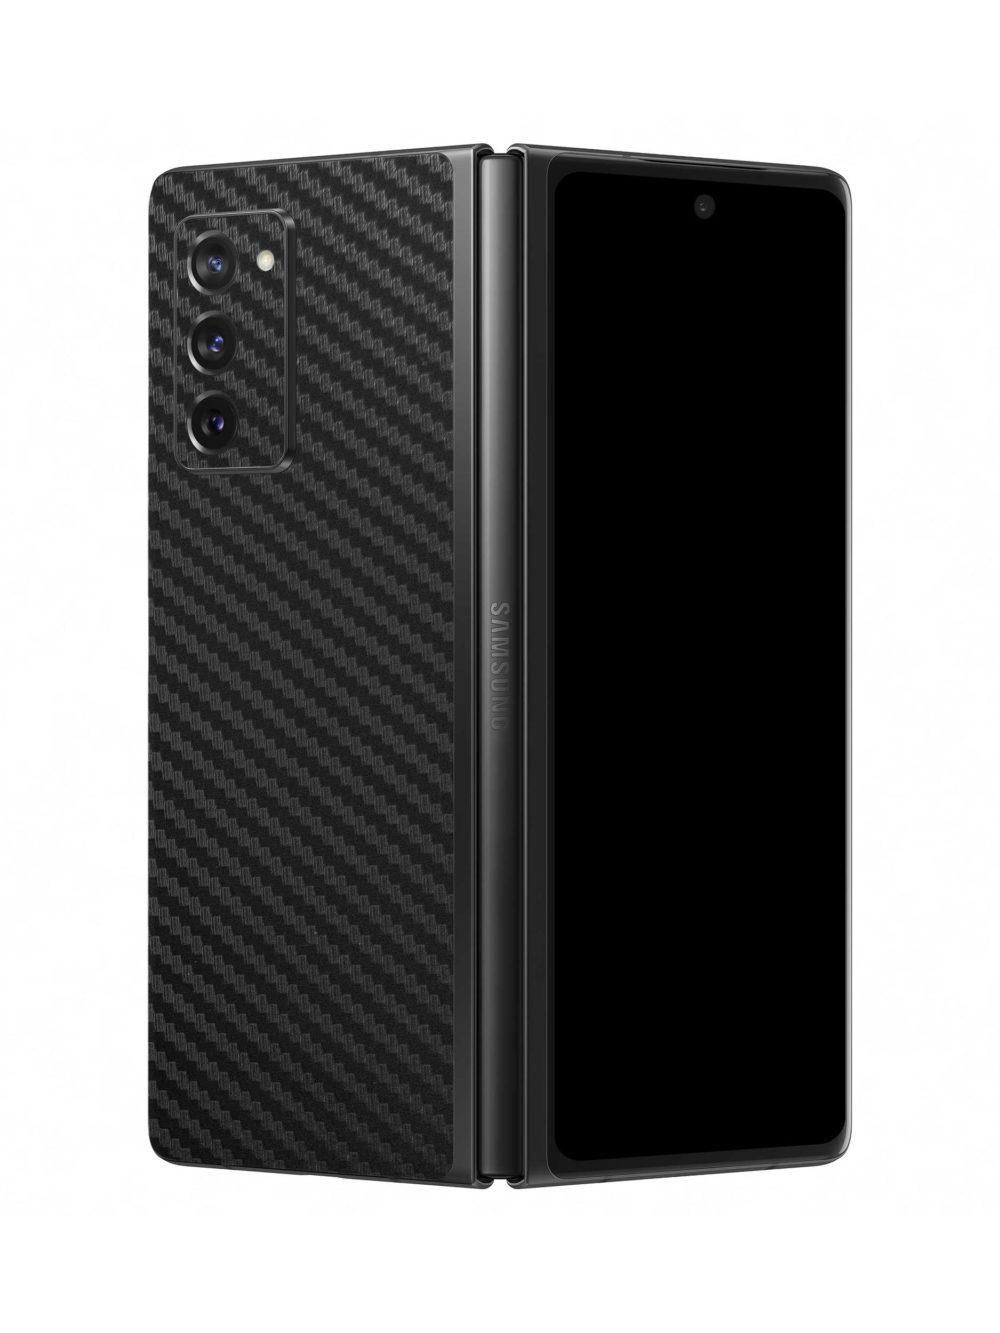 3D Carbon Fibre Vinyl Skin Wrap for Samsung Galaxy Z Fold2 5G